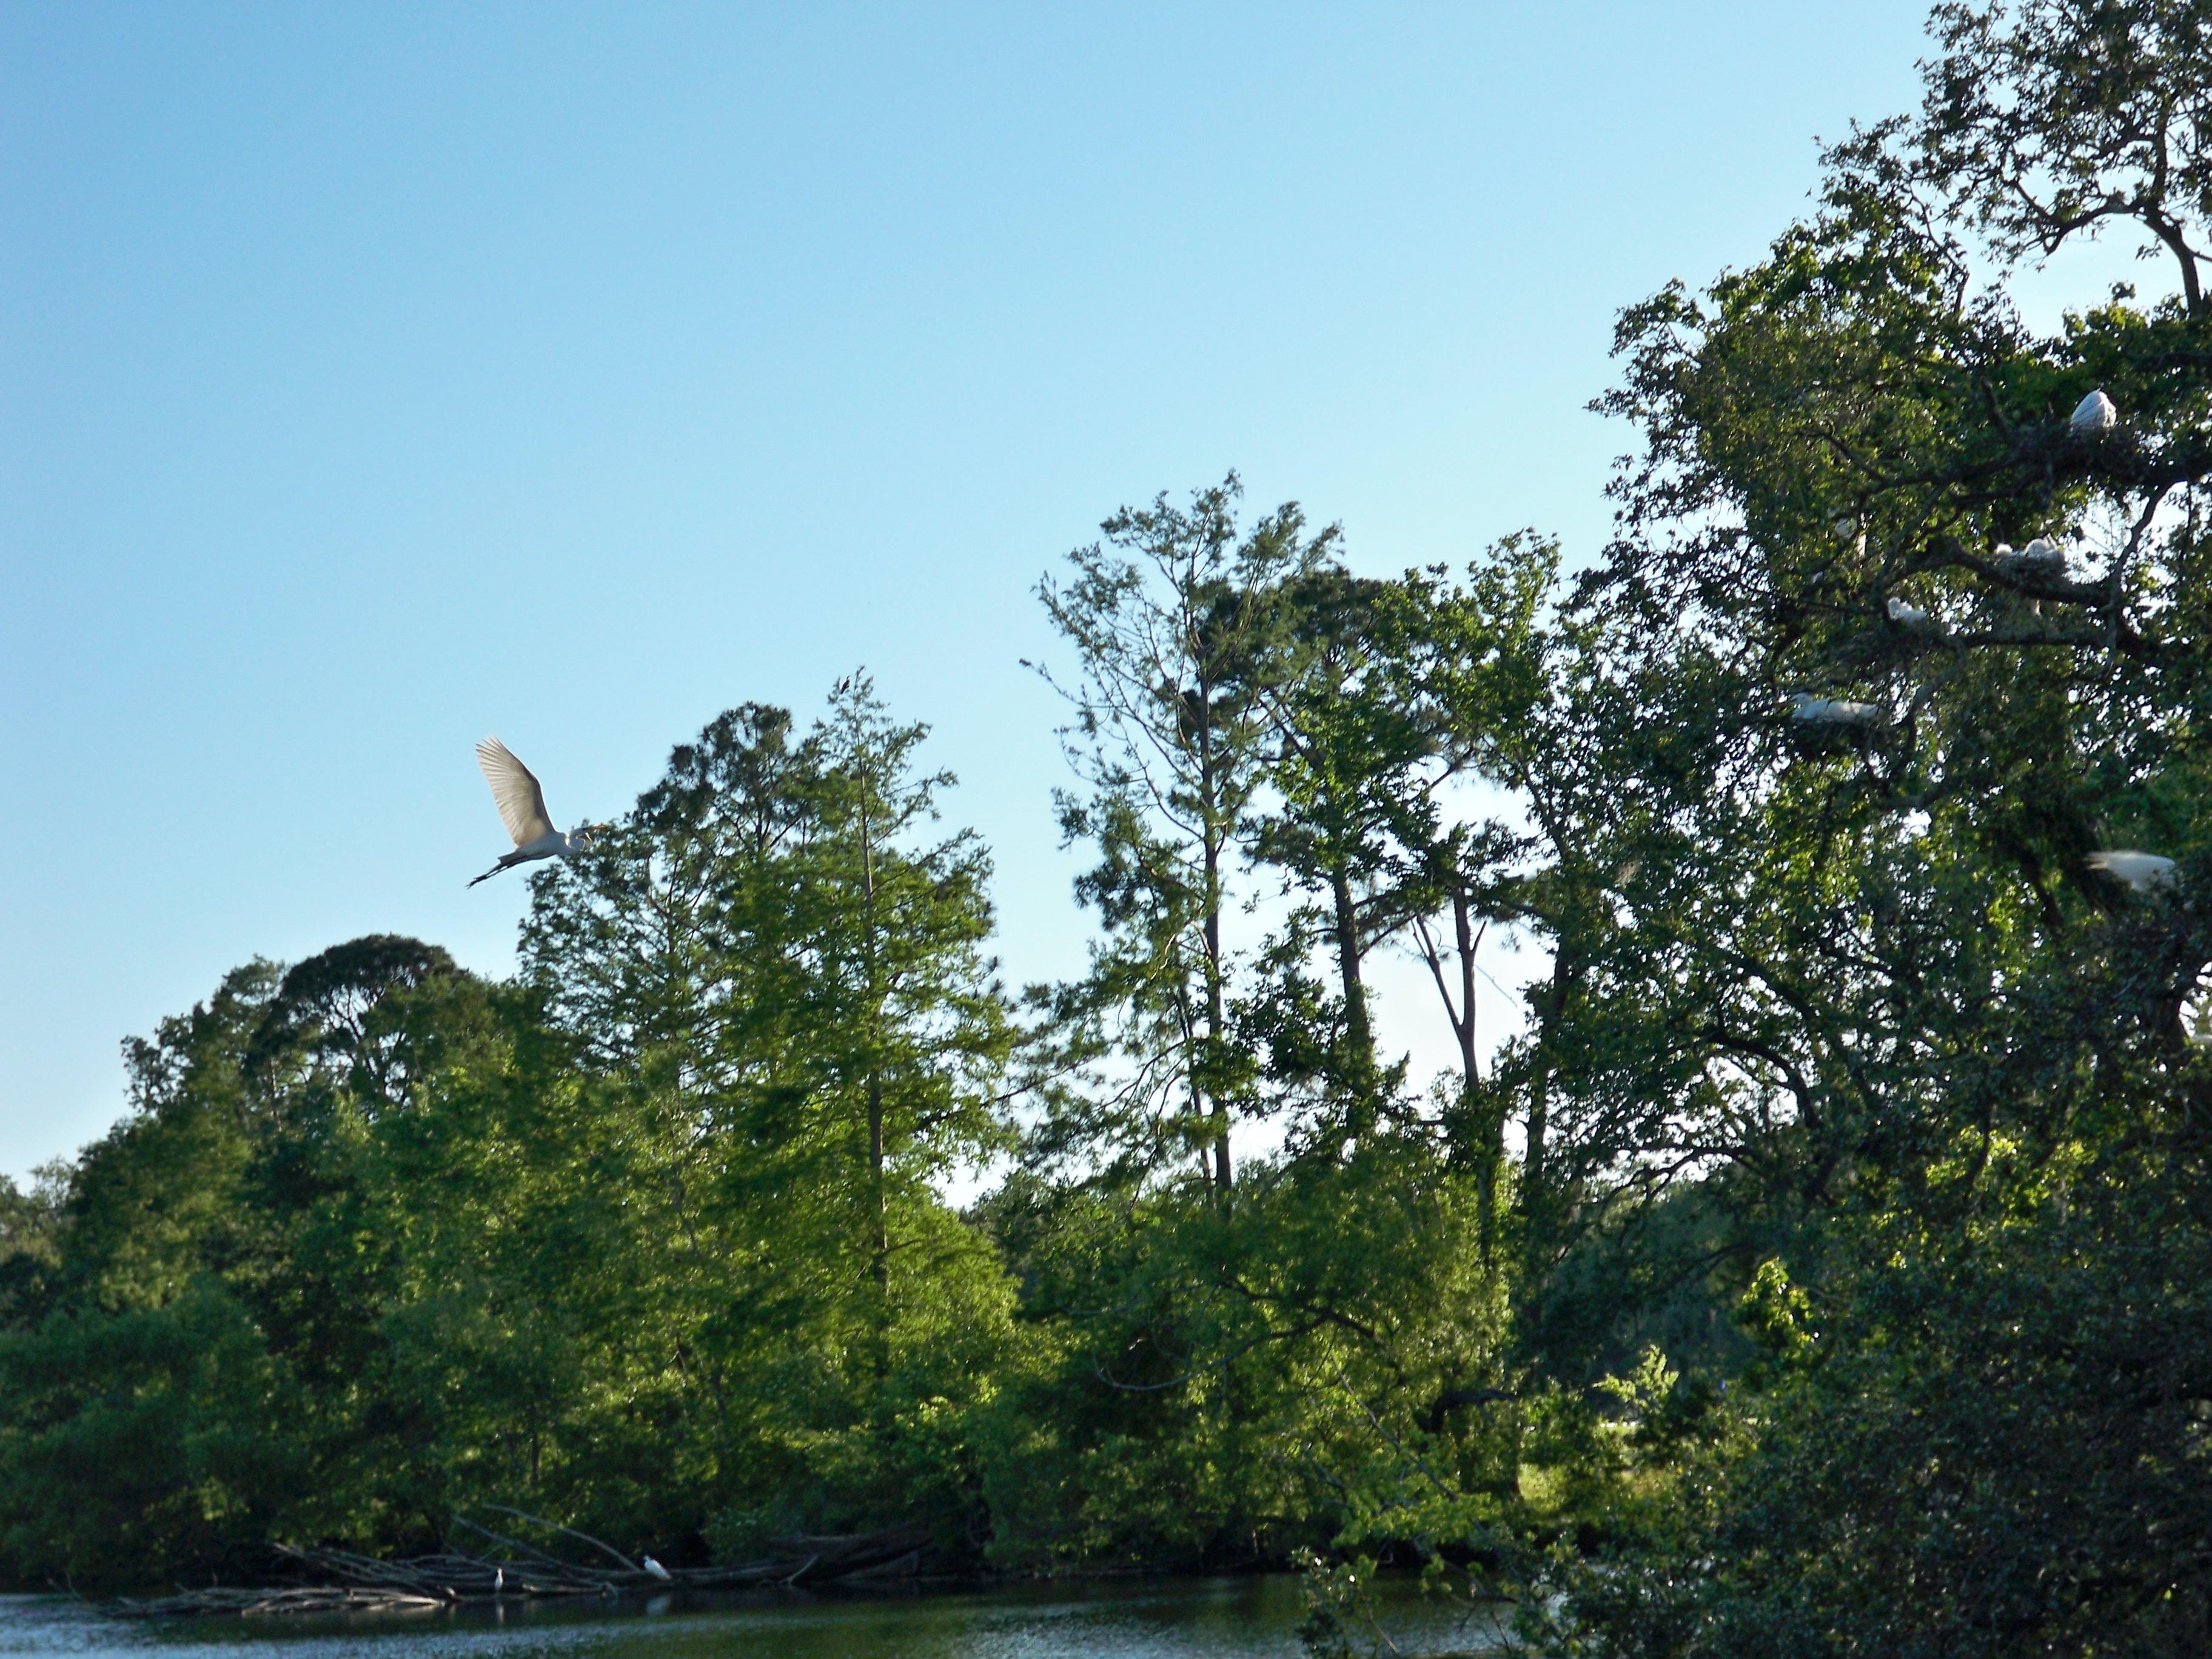 Herons Building Nests in Audubon Park